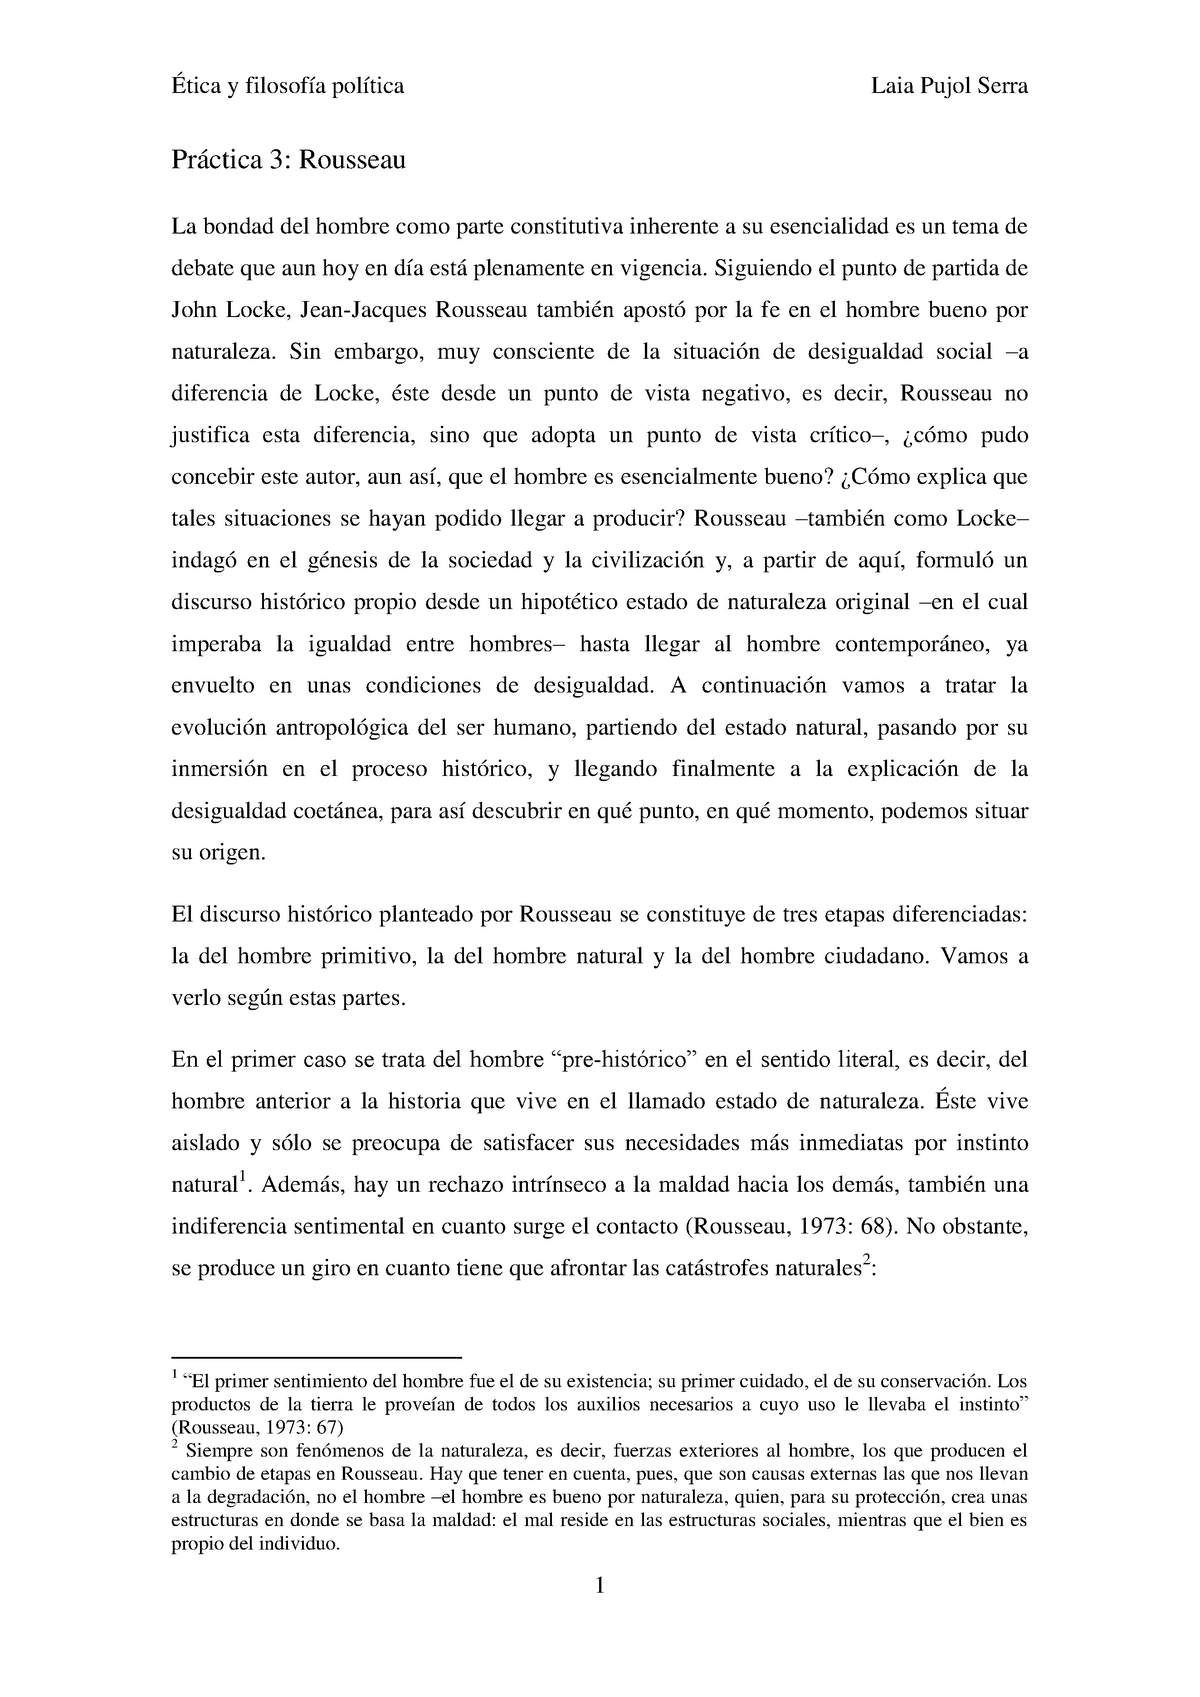 Rousseau Y El Buen Salvaje ètica I Filosofia Política